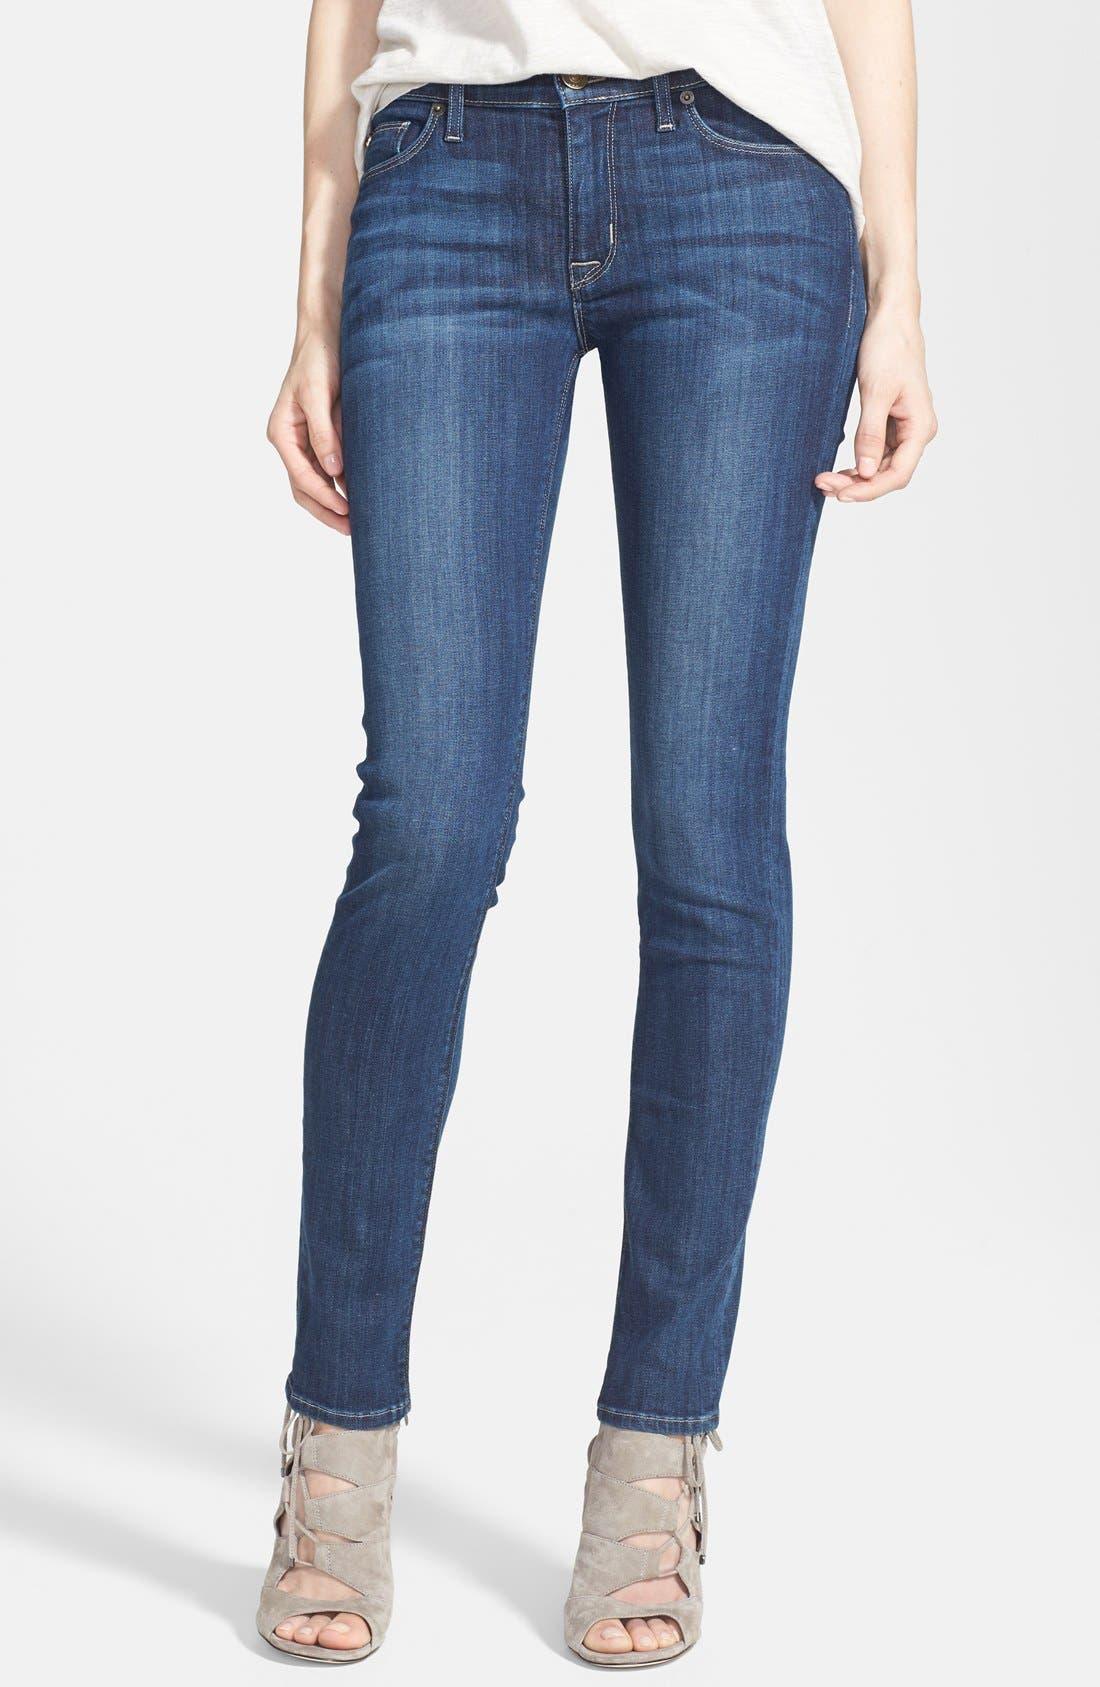 HUDSON JEANS 'Collette' Skinny Jeans, Main, color, 400